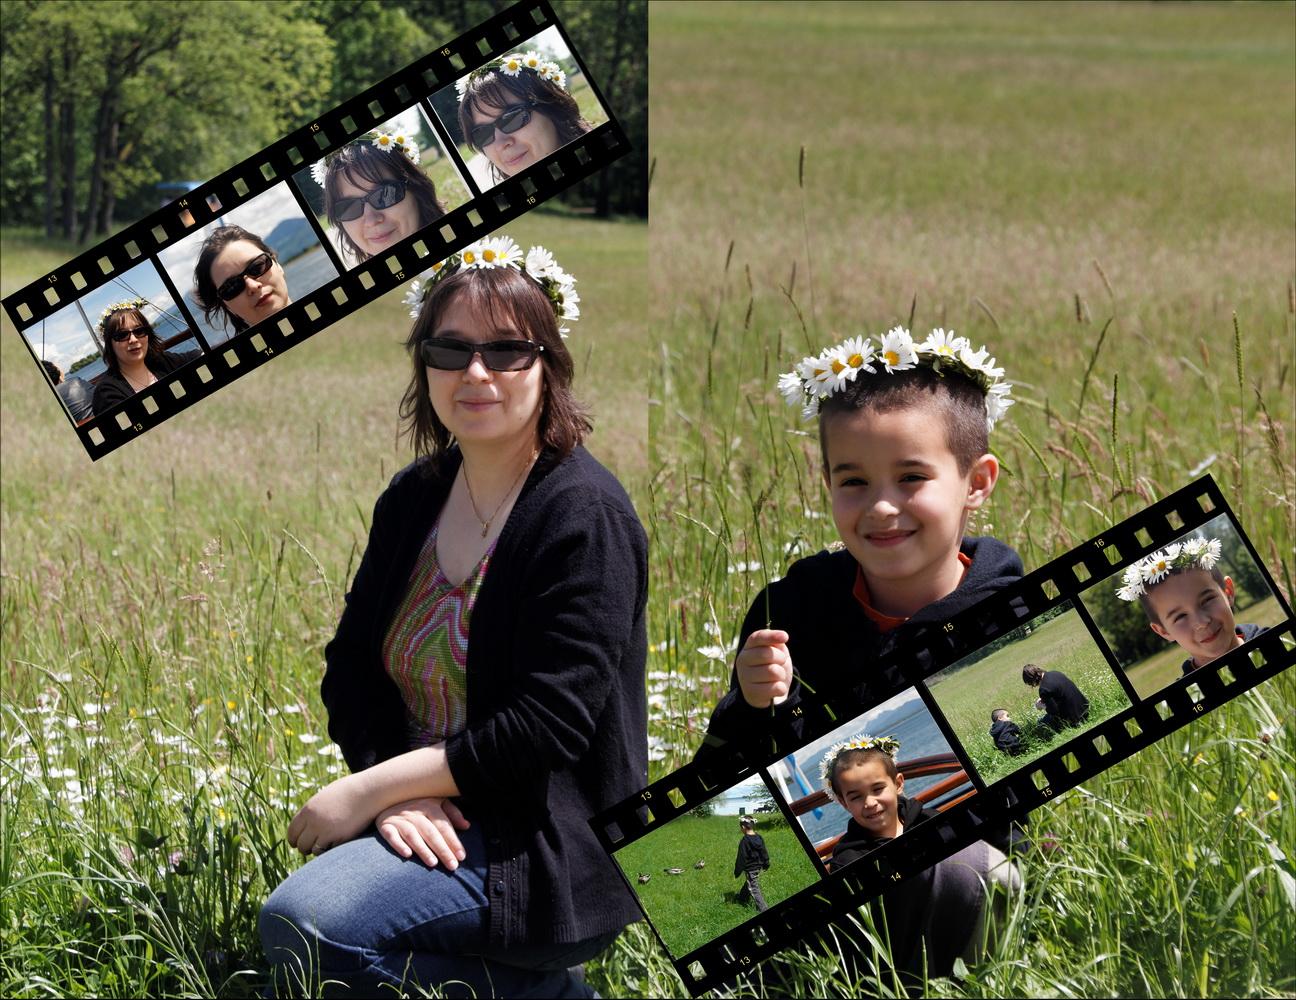 http://pics.livejournal.com/bambik/pic/0043x0t4